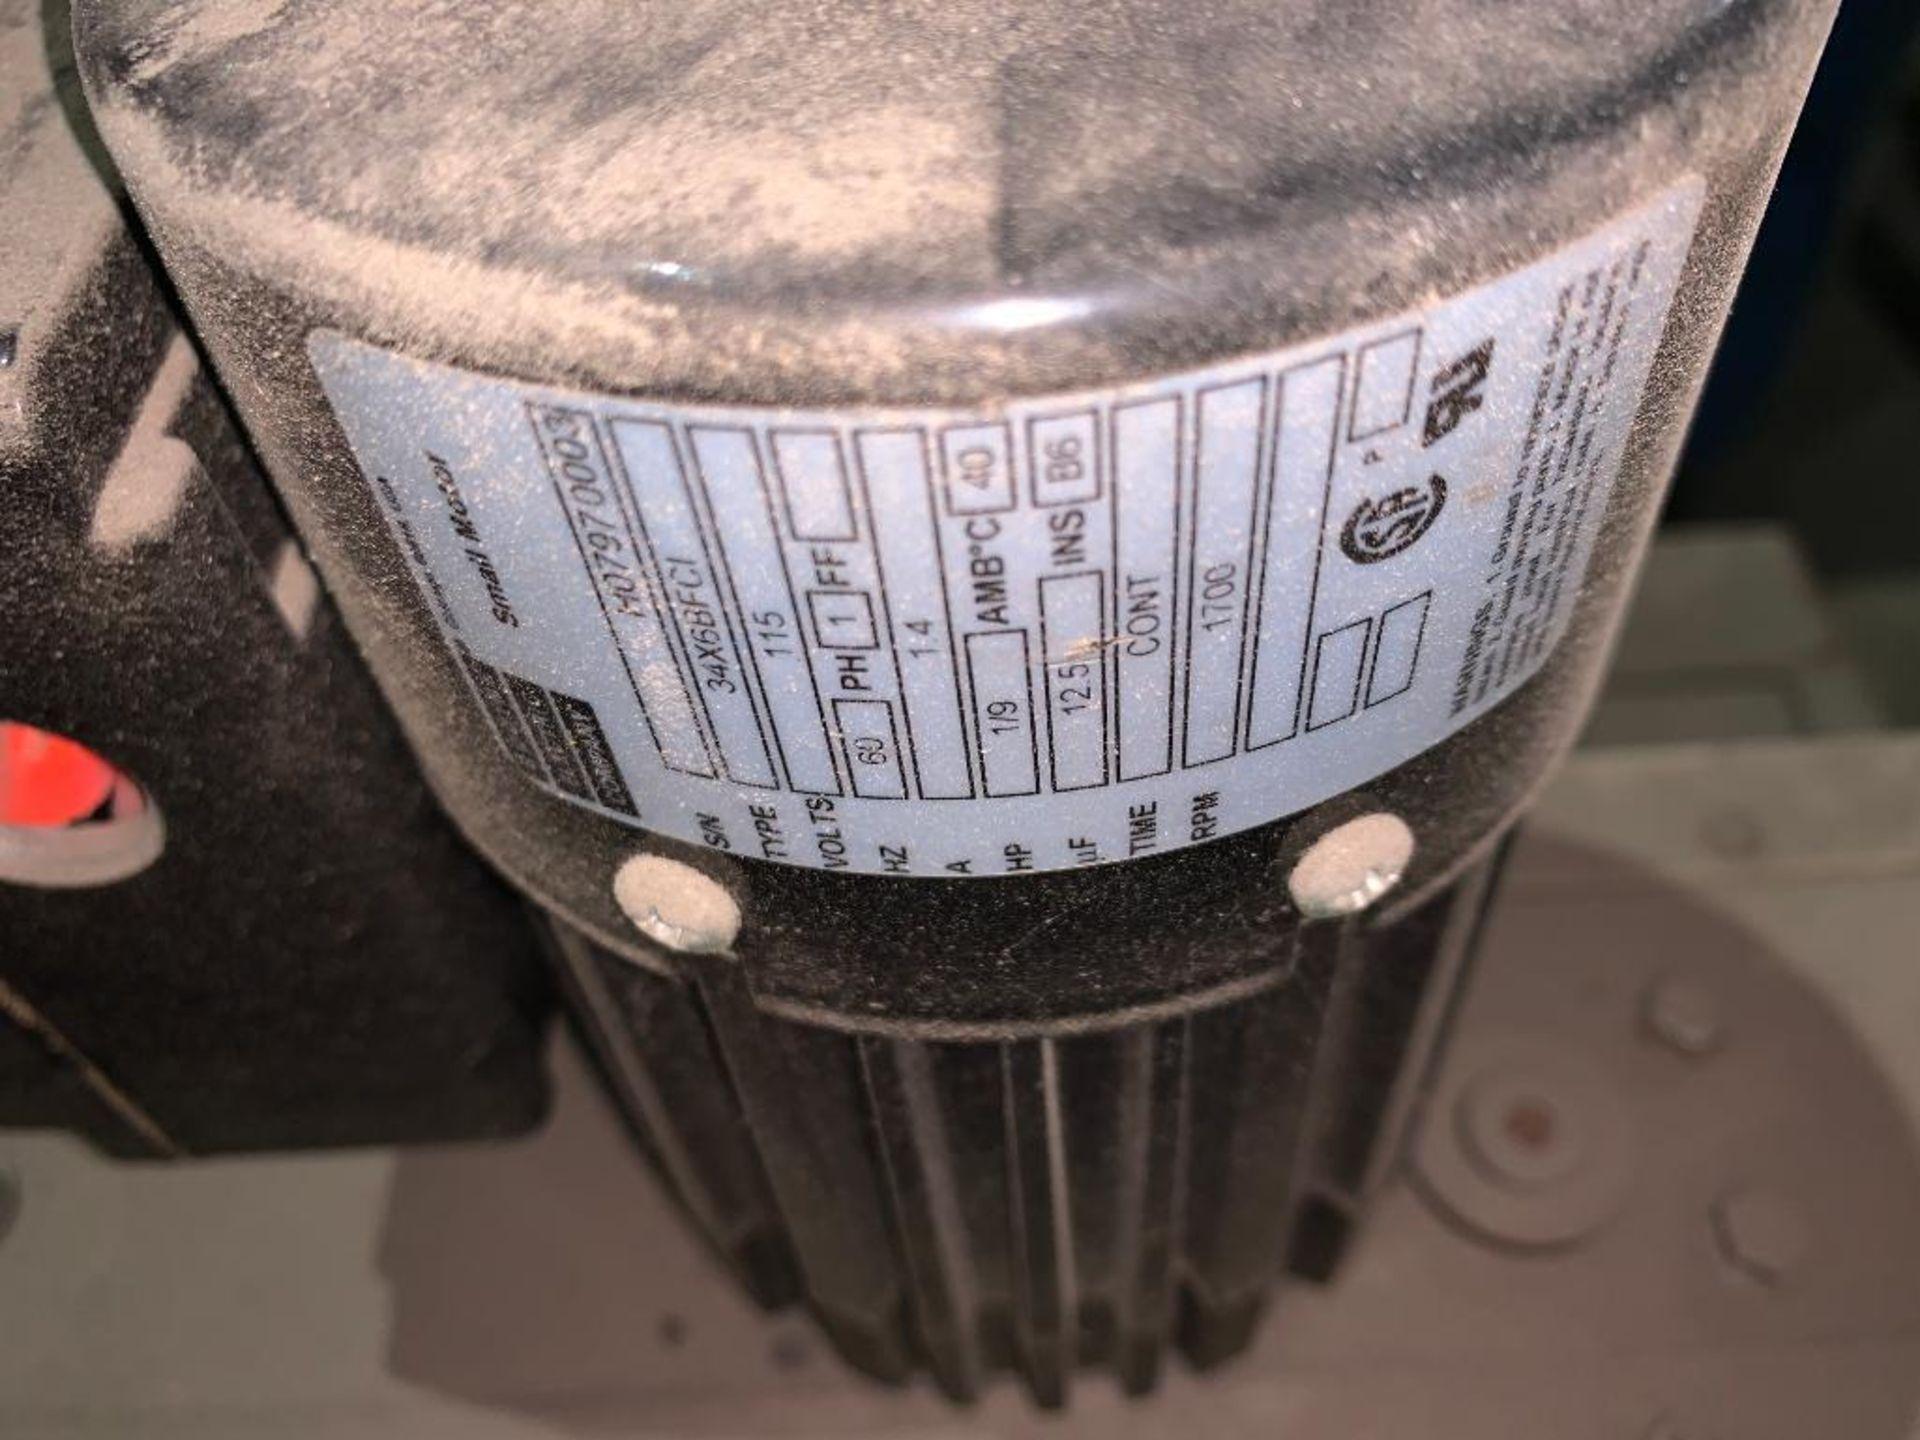 3M-Matic case taper - Image 7 of 15